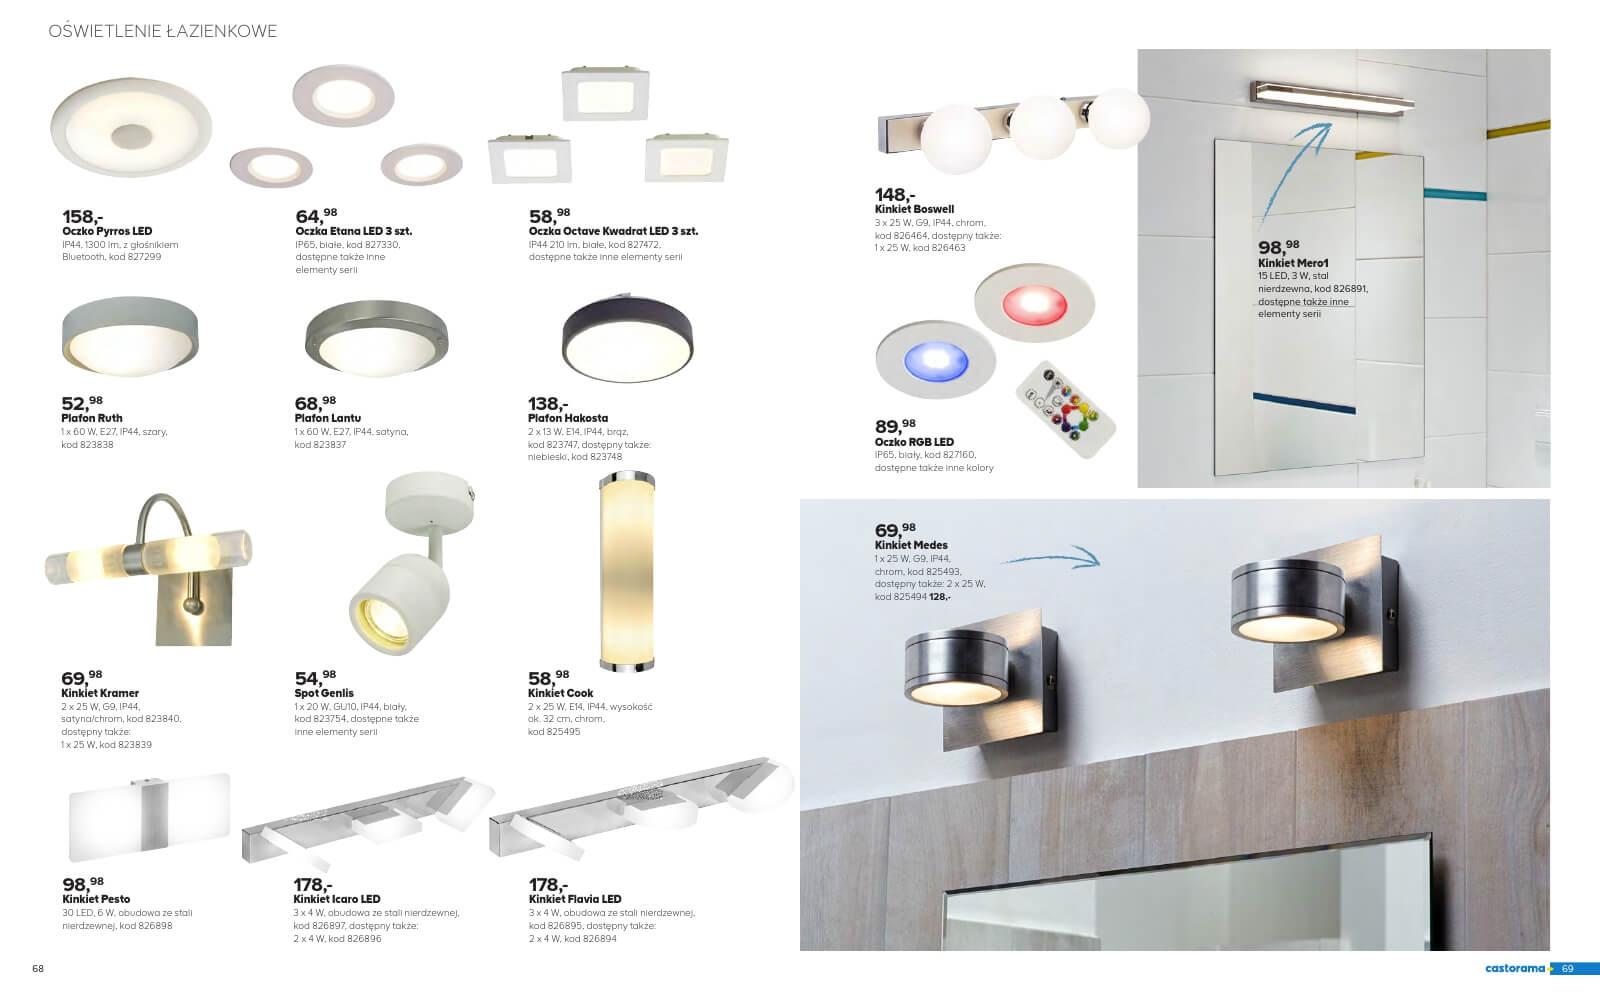 Castorama Katalog łazienka 2018 Str35